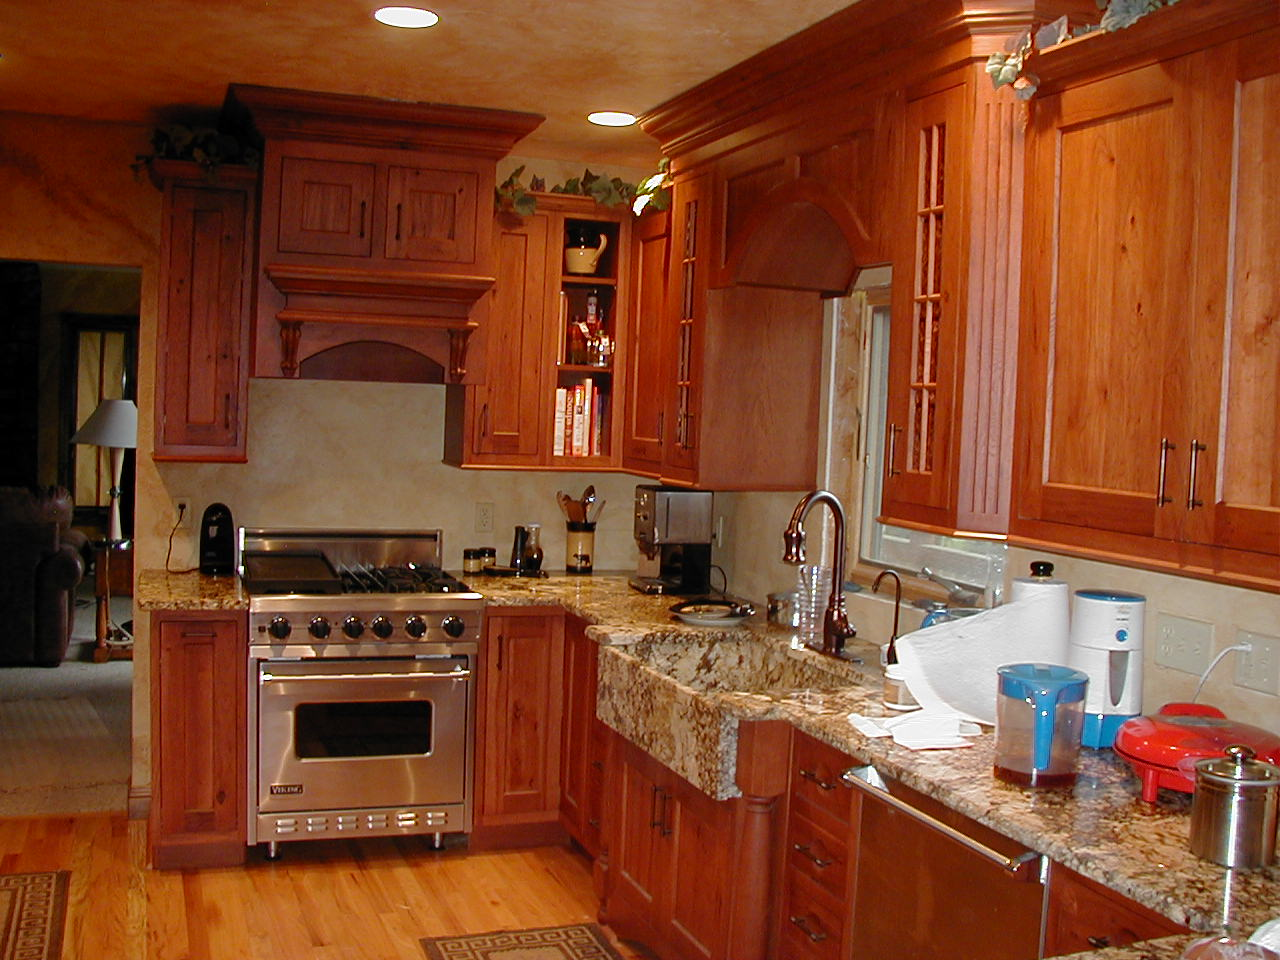 Project 12 - Bespoke Kitchen Design   Bespoke Kitchen Design ...